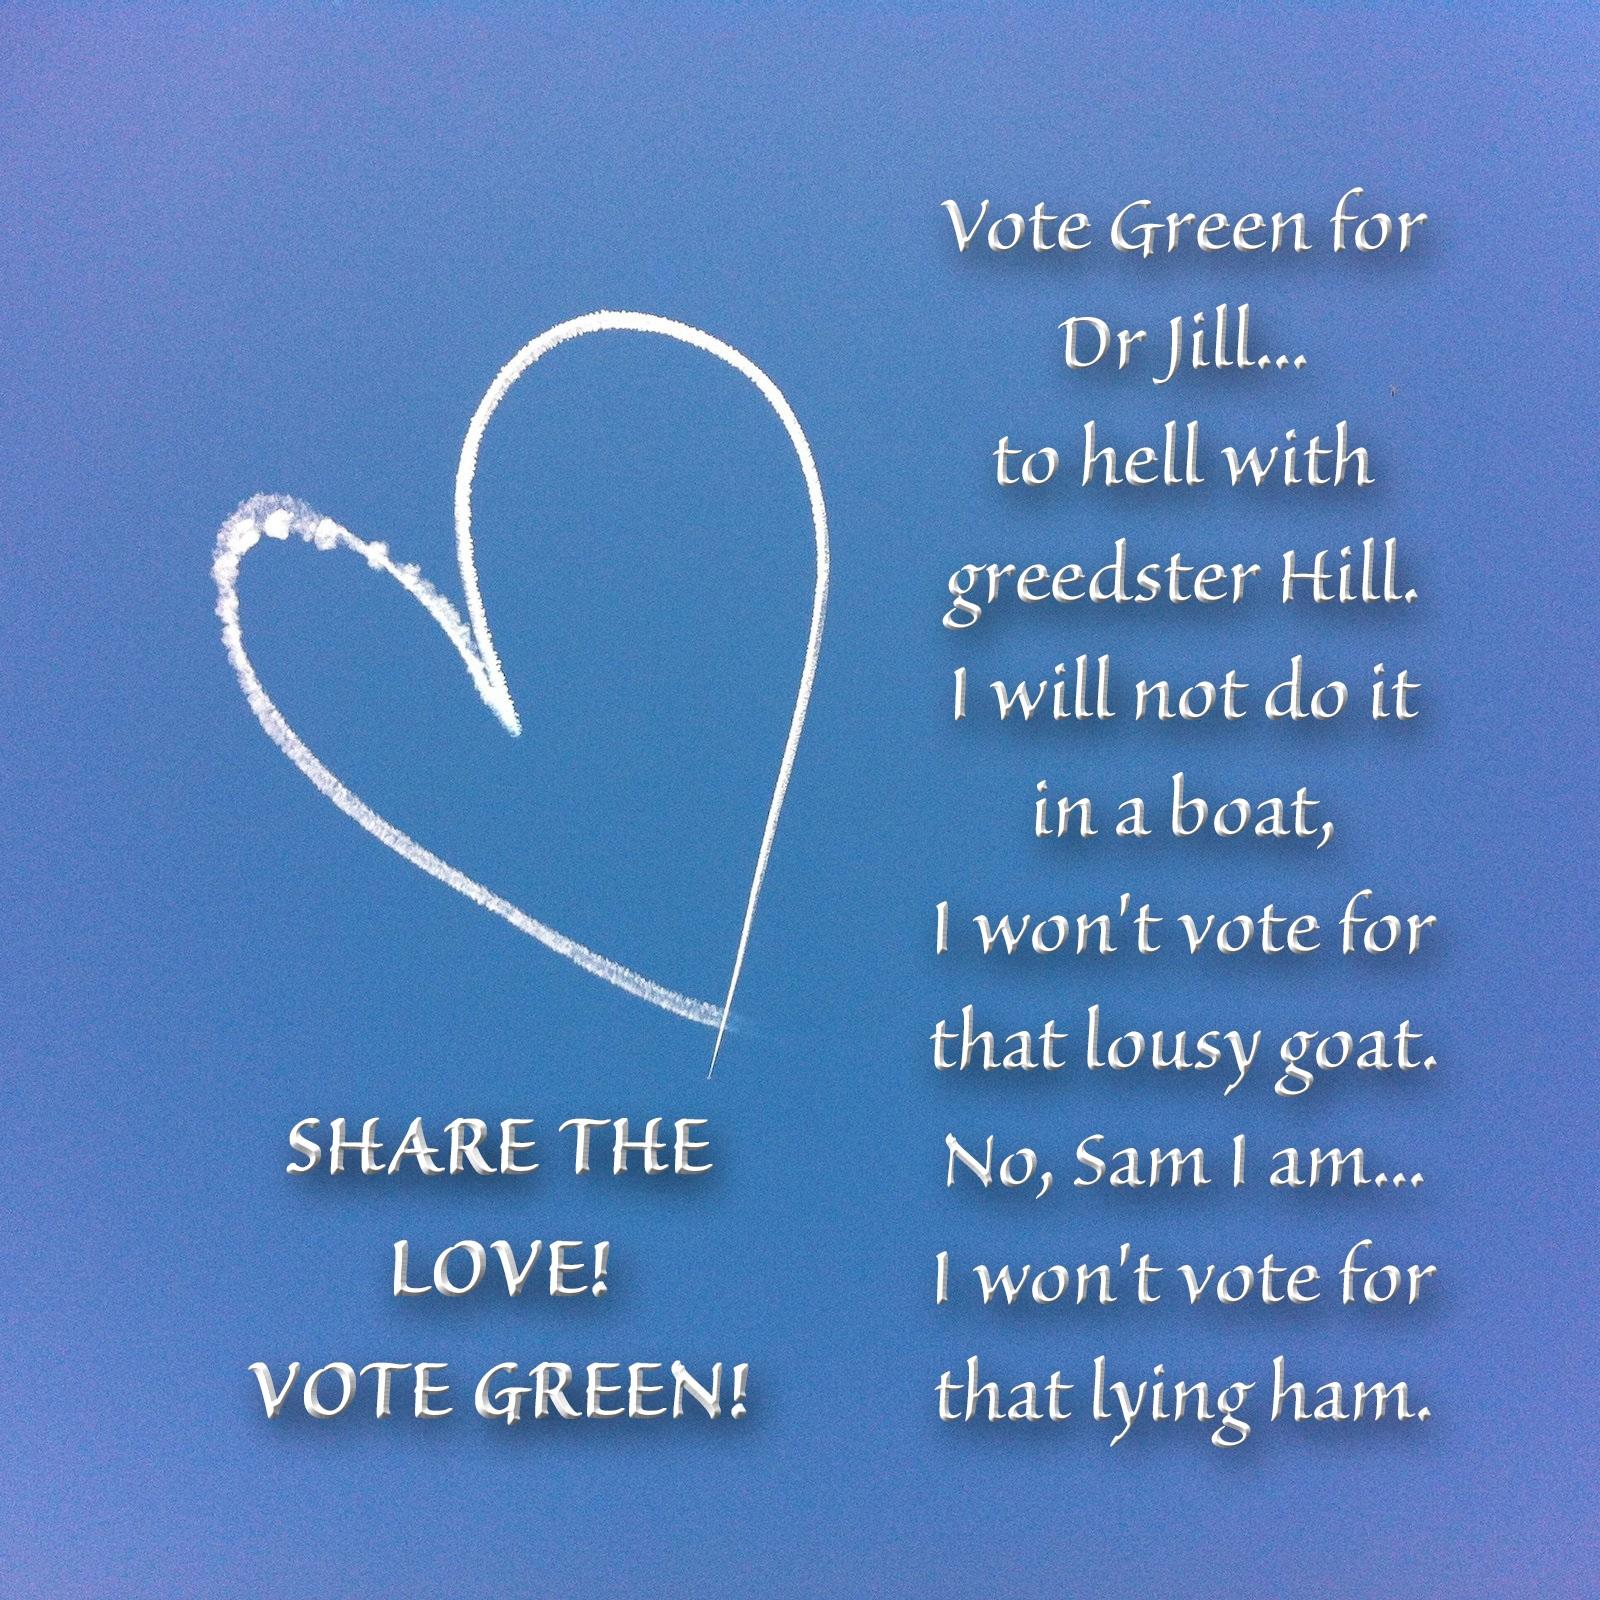 00-vote-green-101016